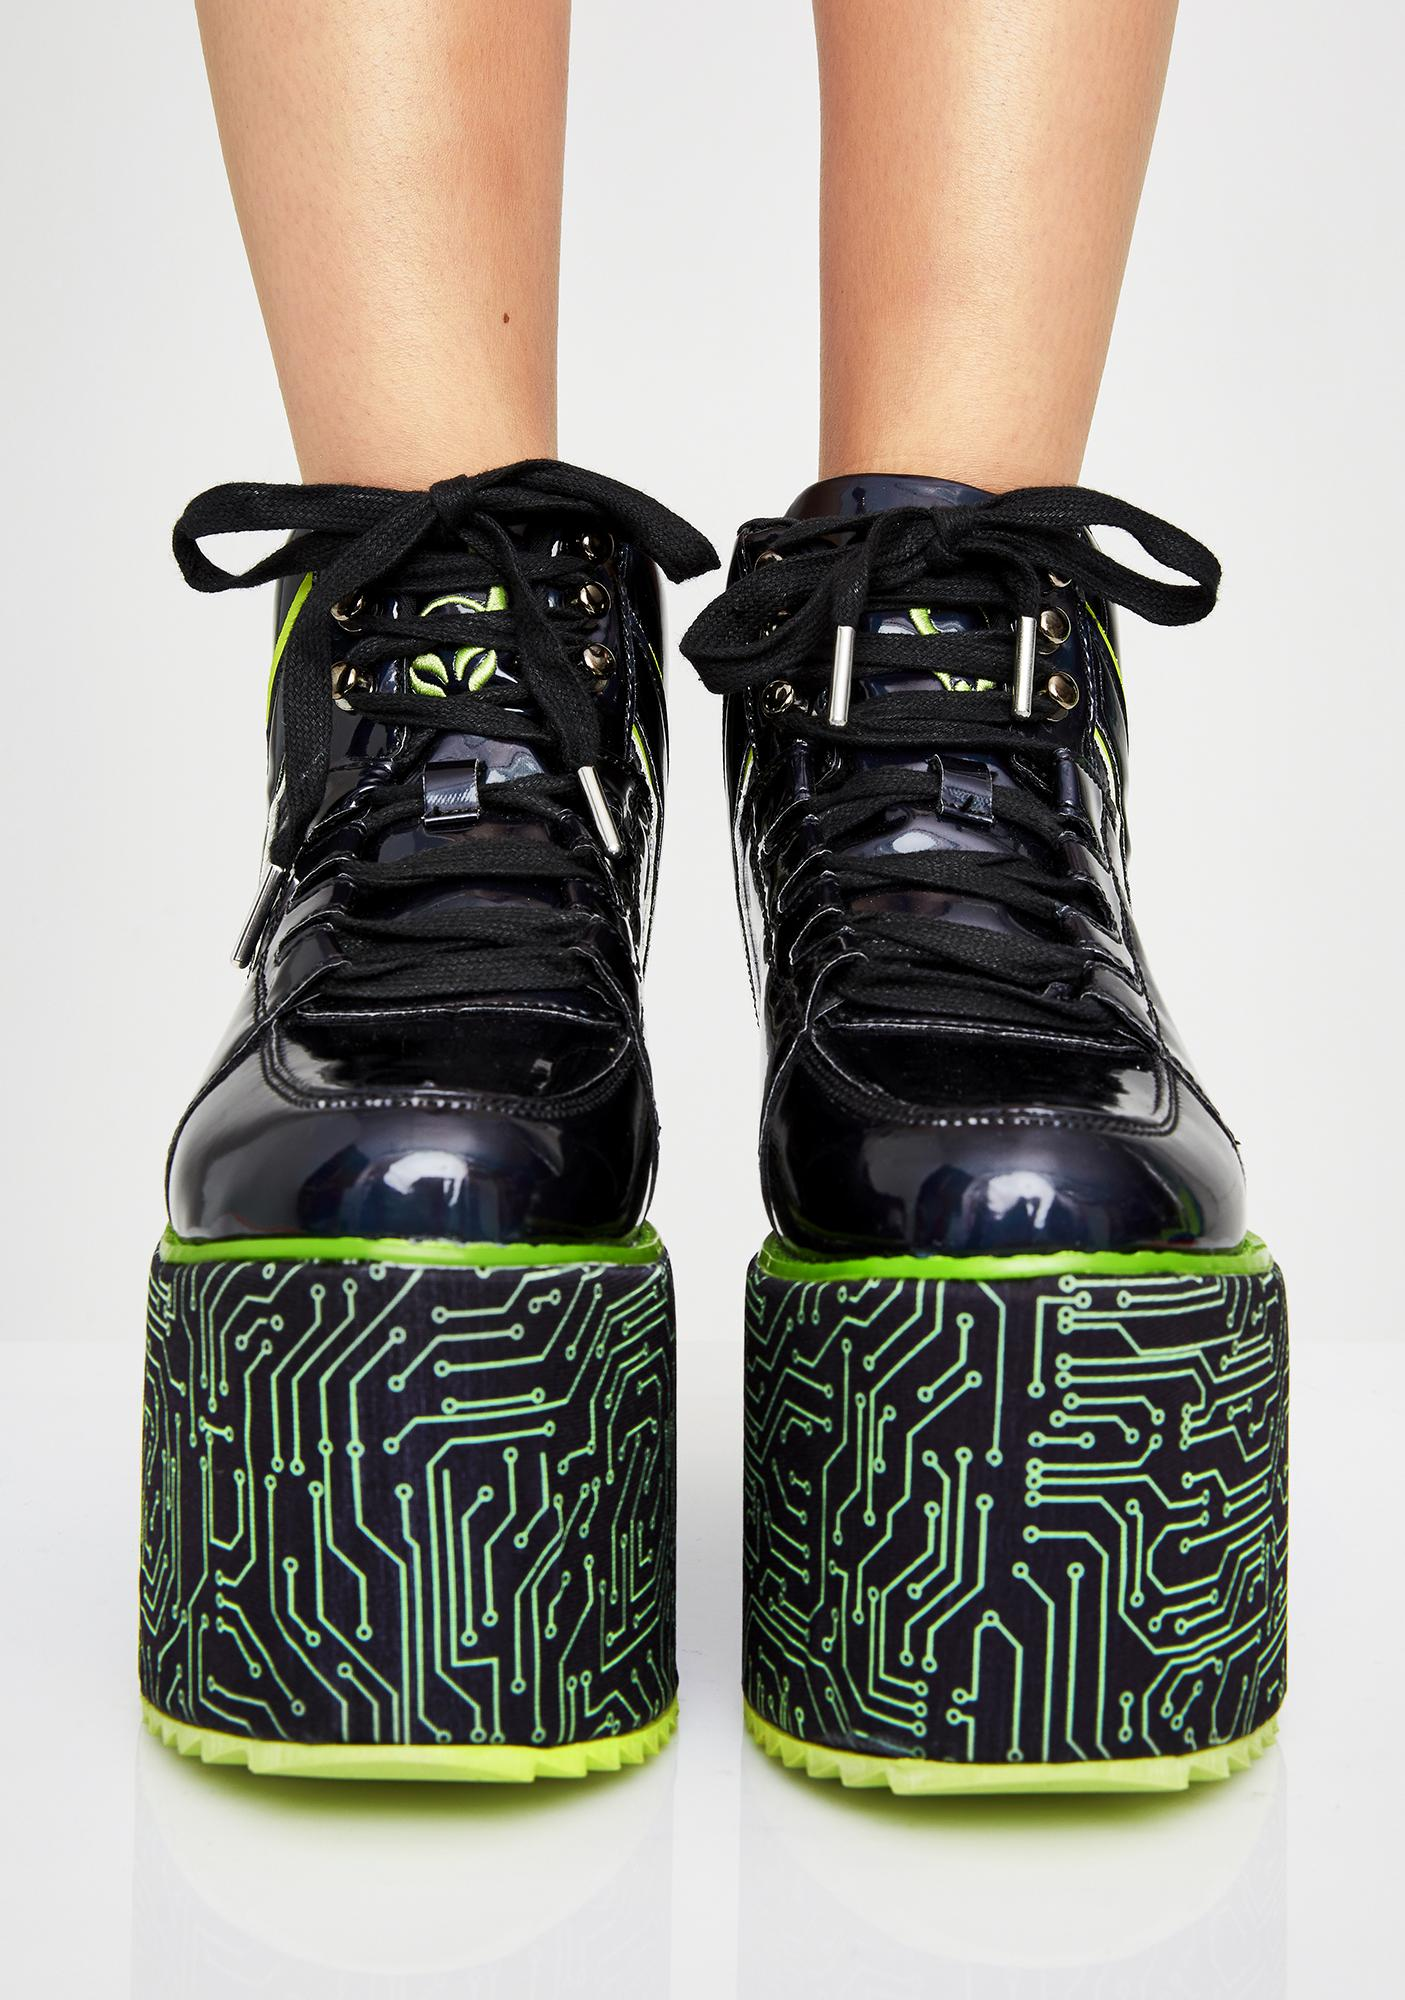 Y.R.U. x Cyberdog Qozmo Platform Sneakers